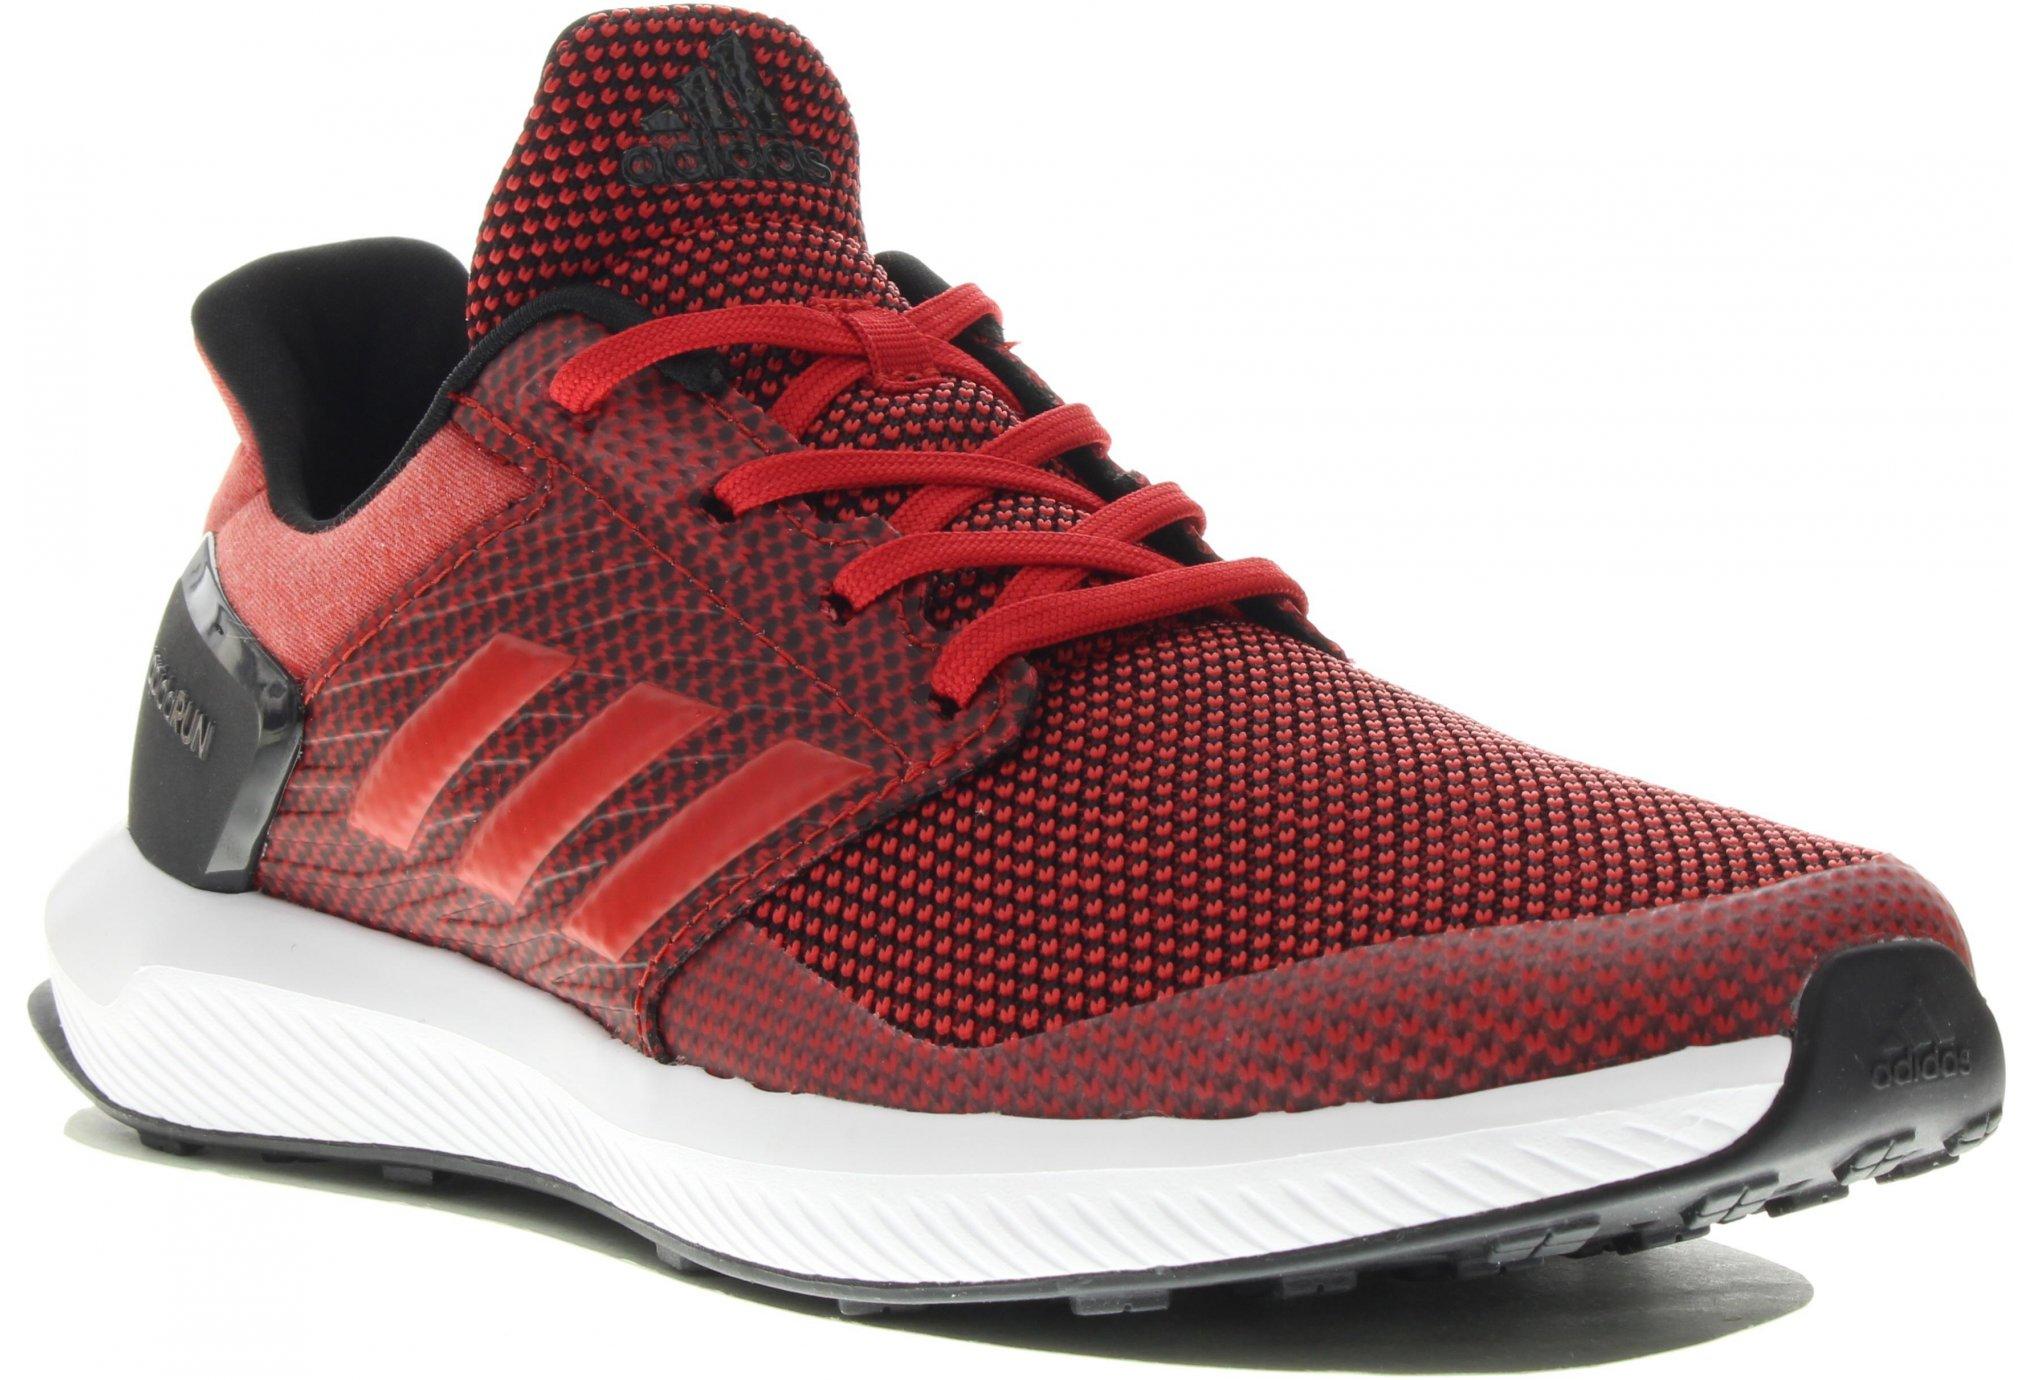 adidas RapidaRun Junior Chaussures running femme